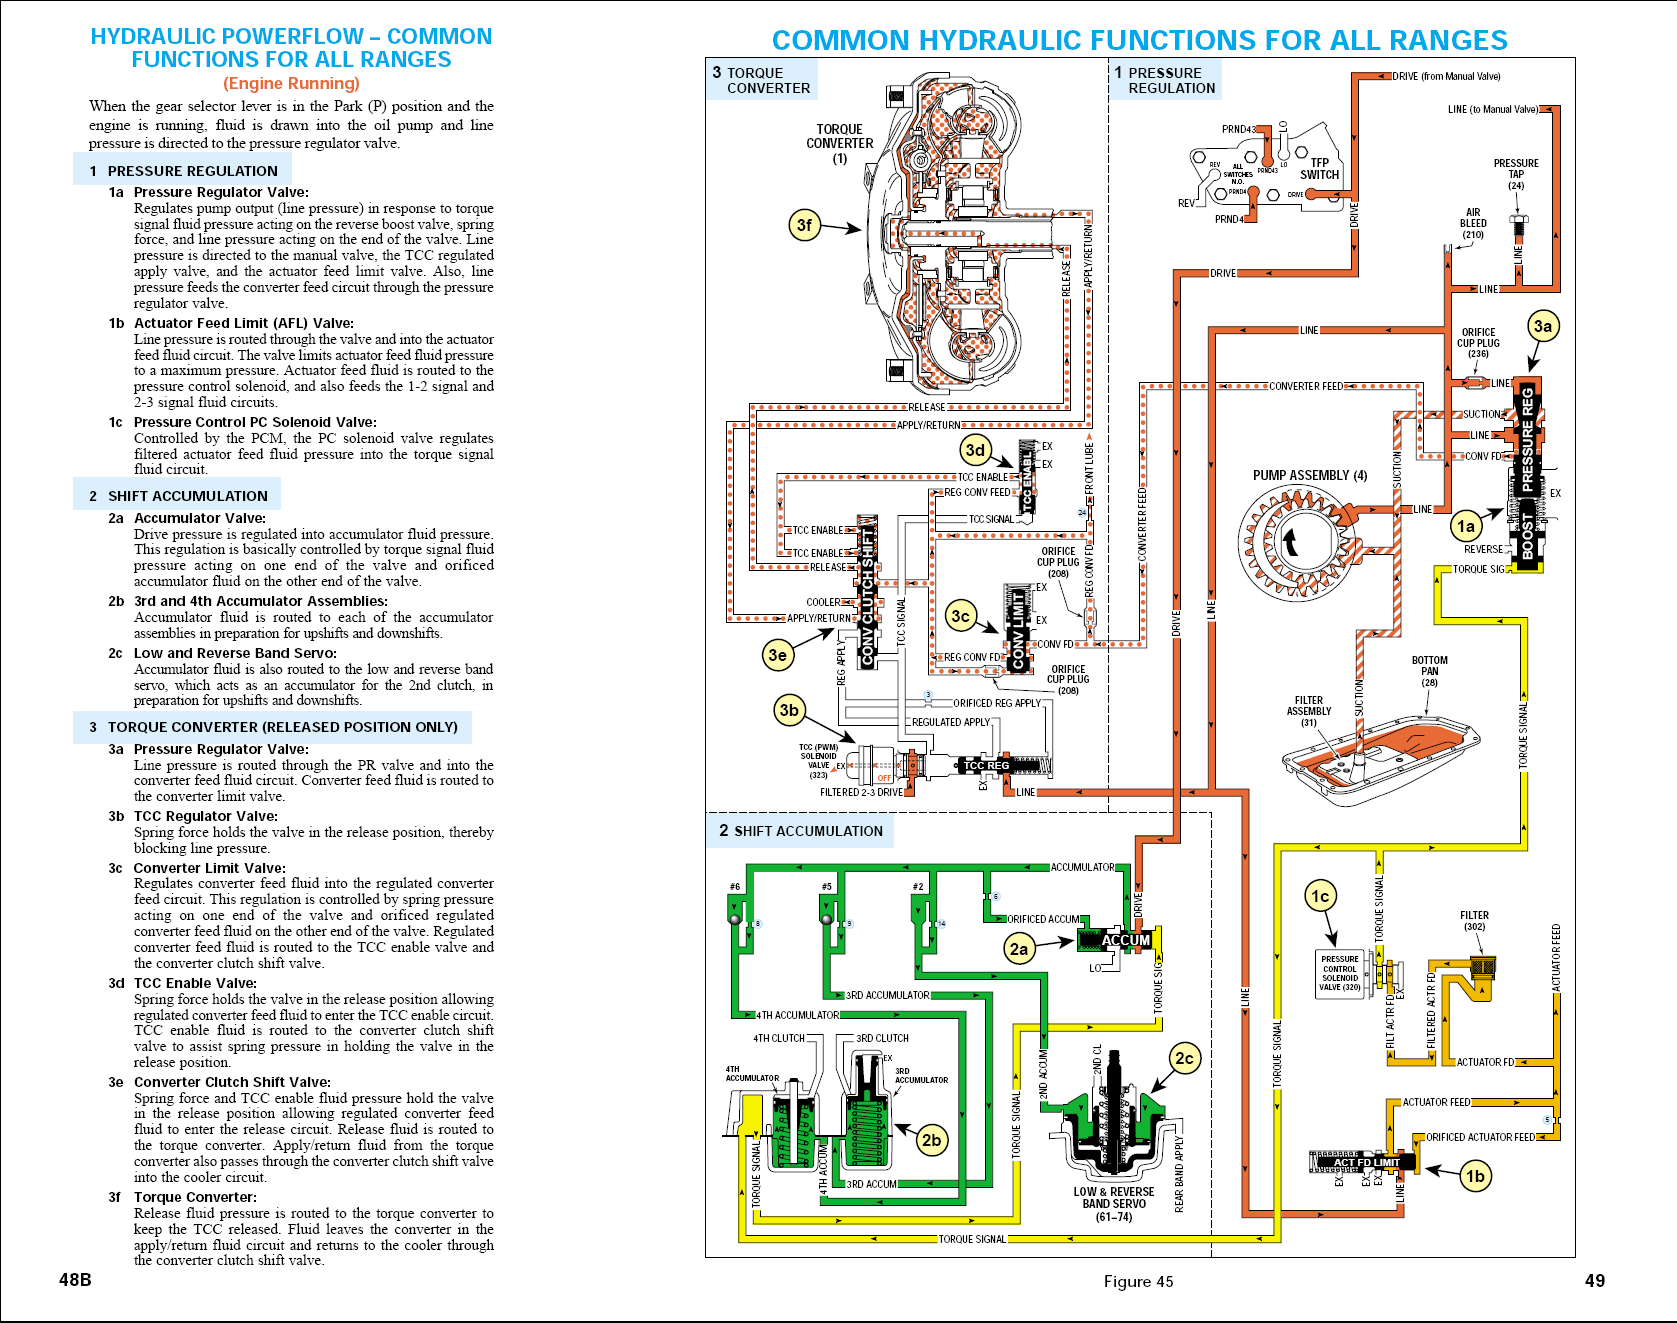 Pin by Angela Schmid on Mechanic's Corner | Diagram, Chevy